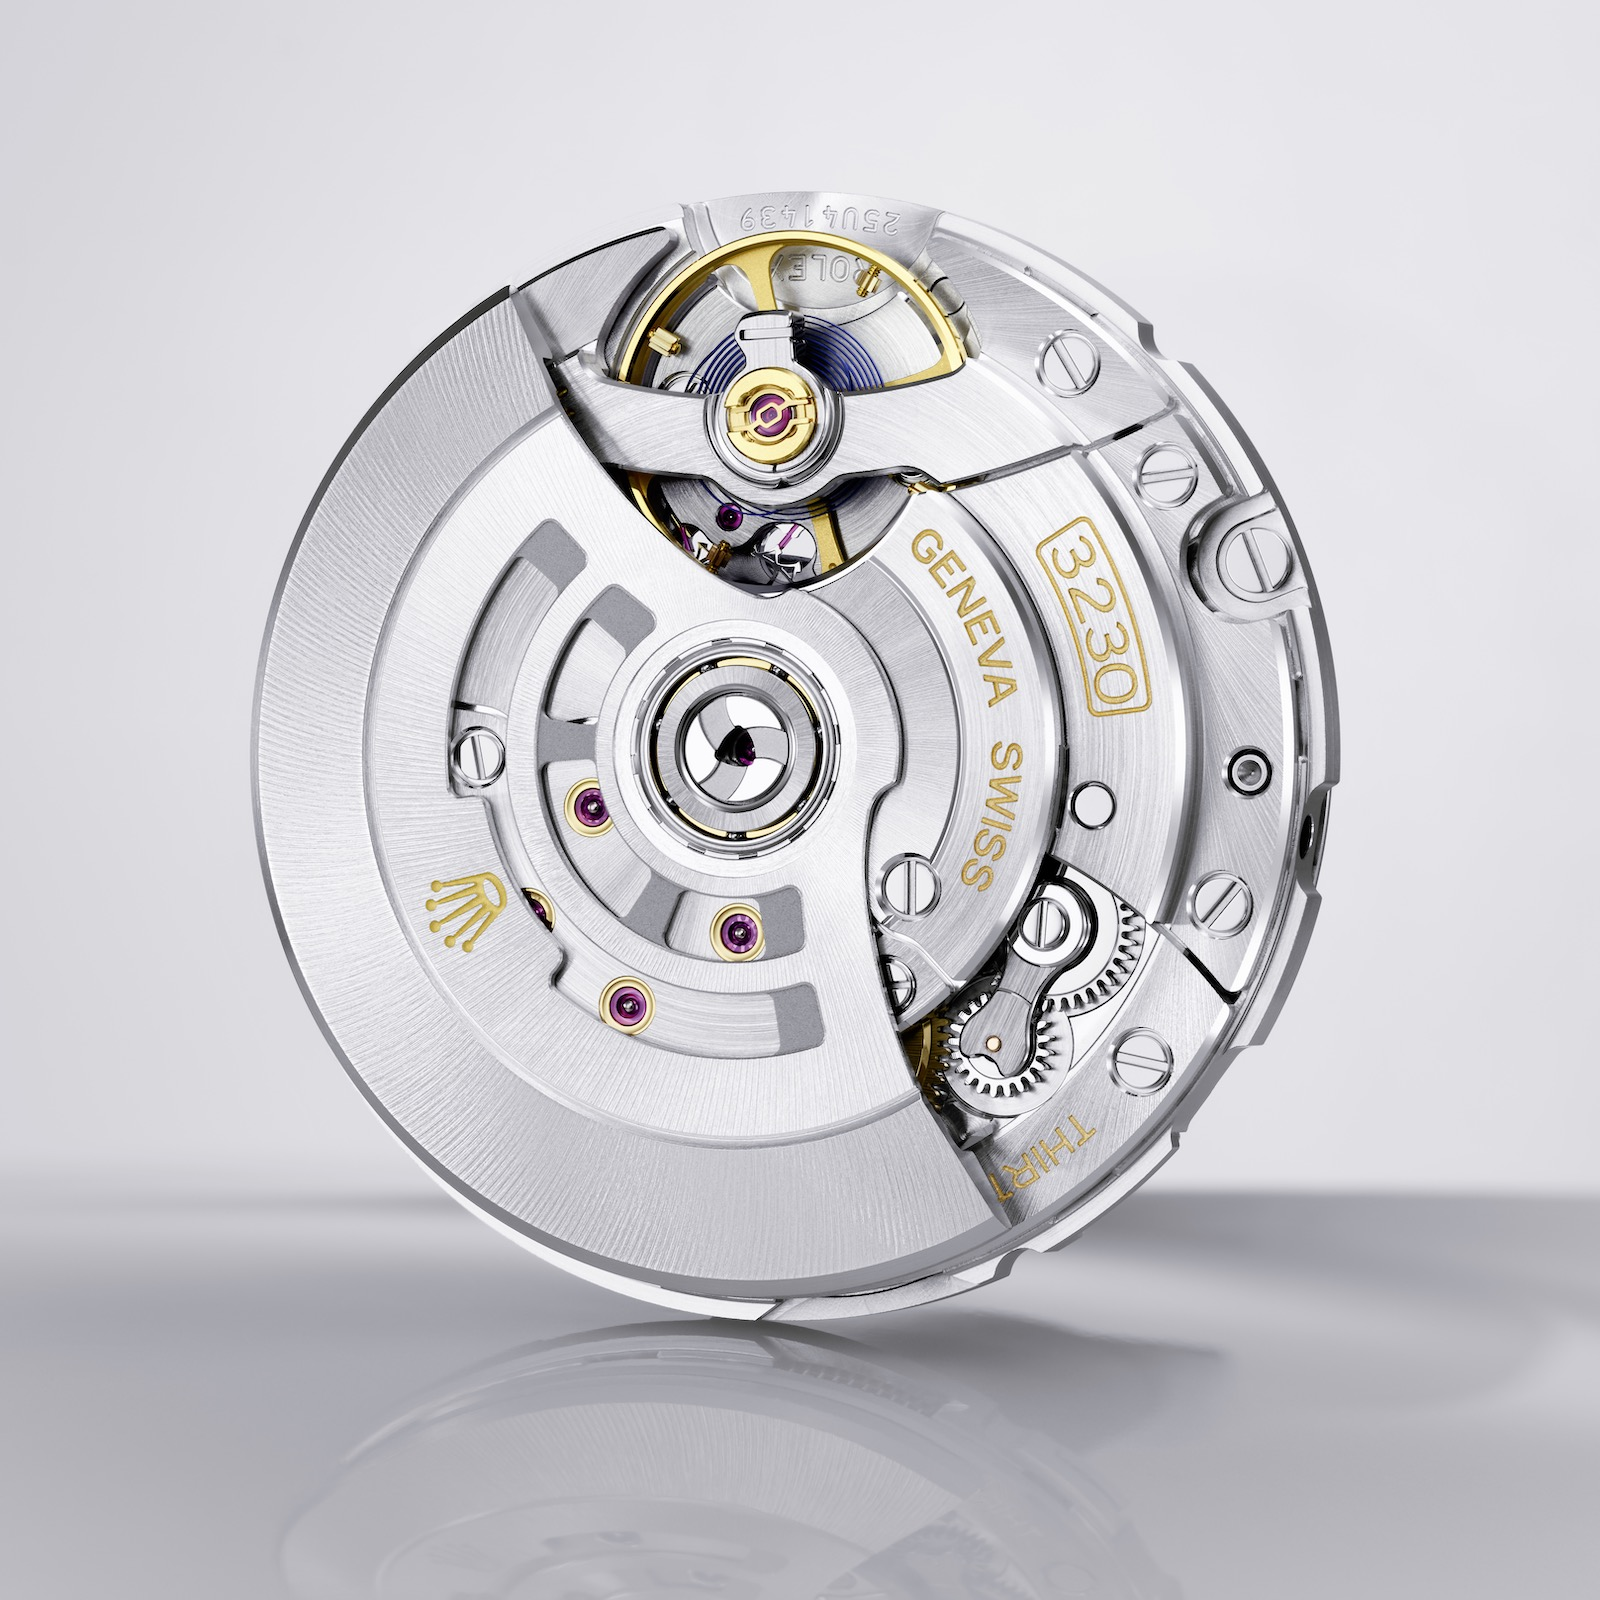 Calibre 3230 de Rolex Submariner 124060